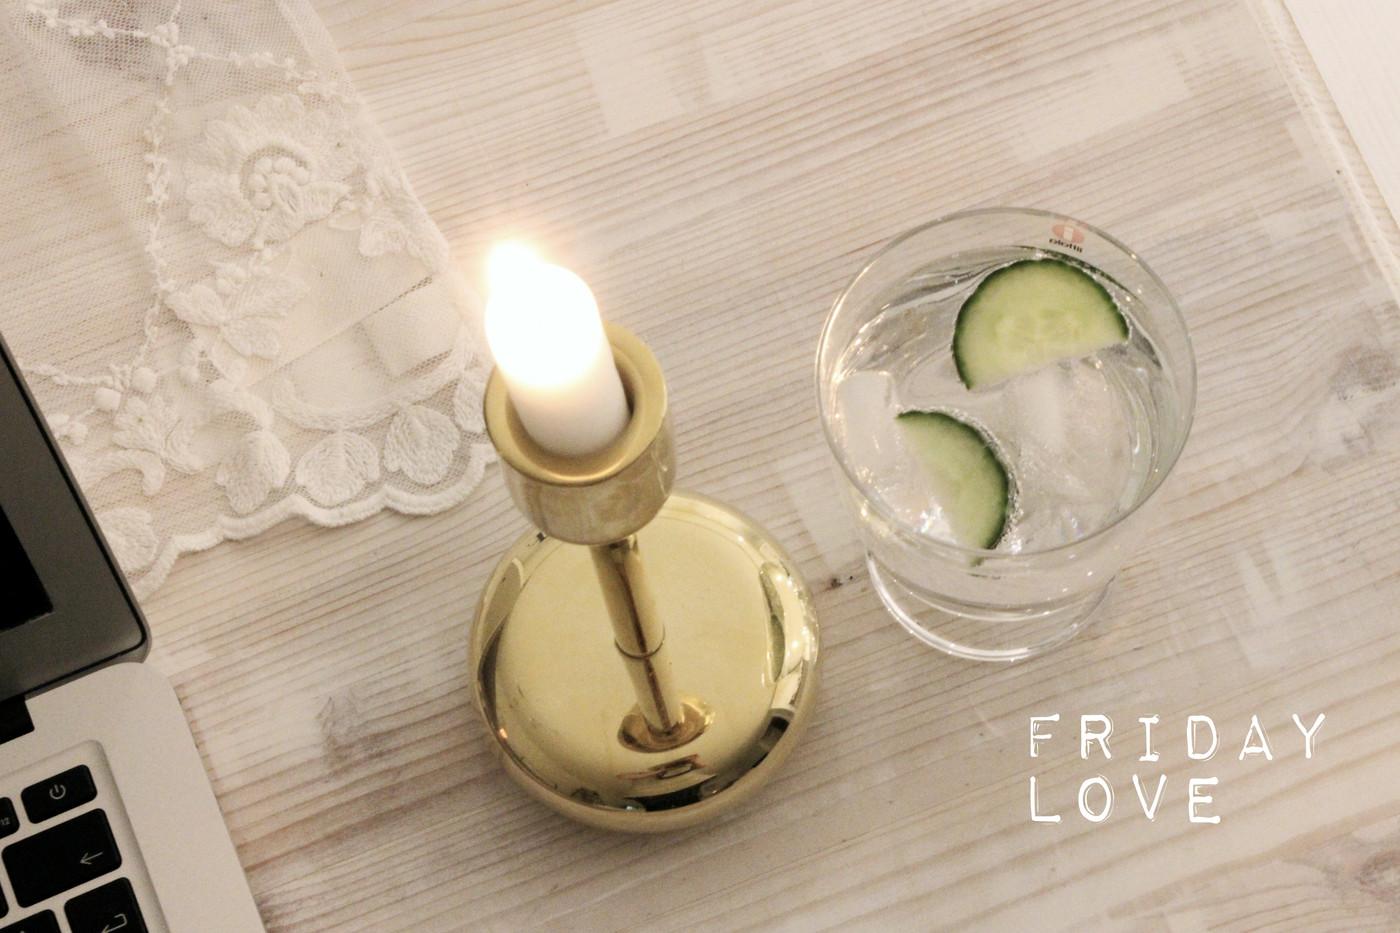 friday love.jpg